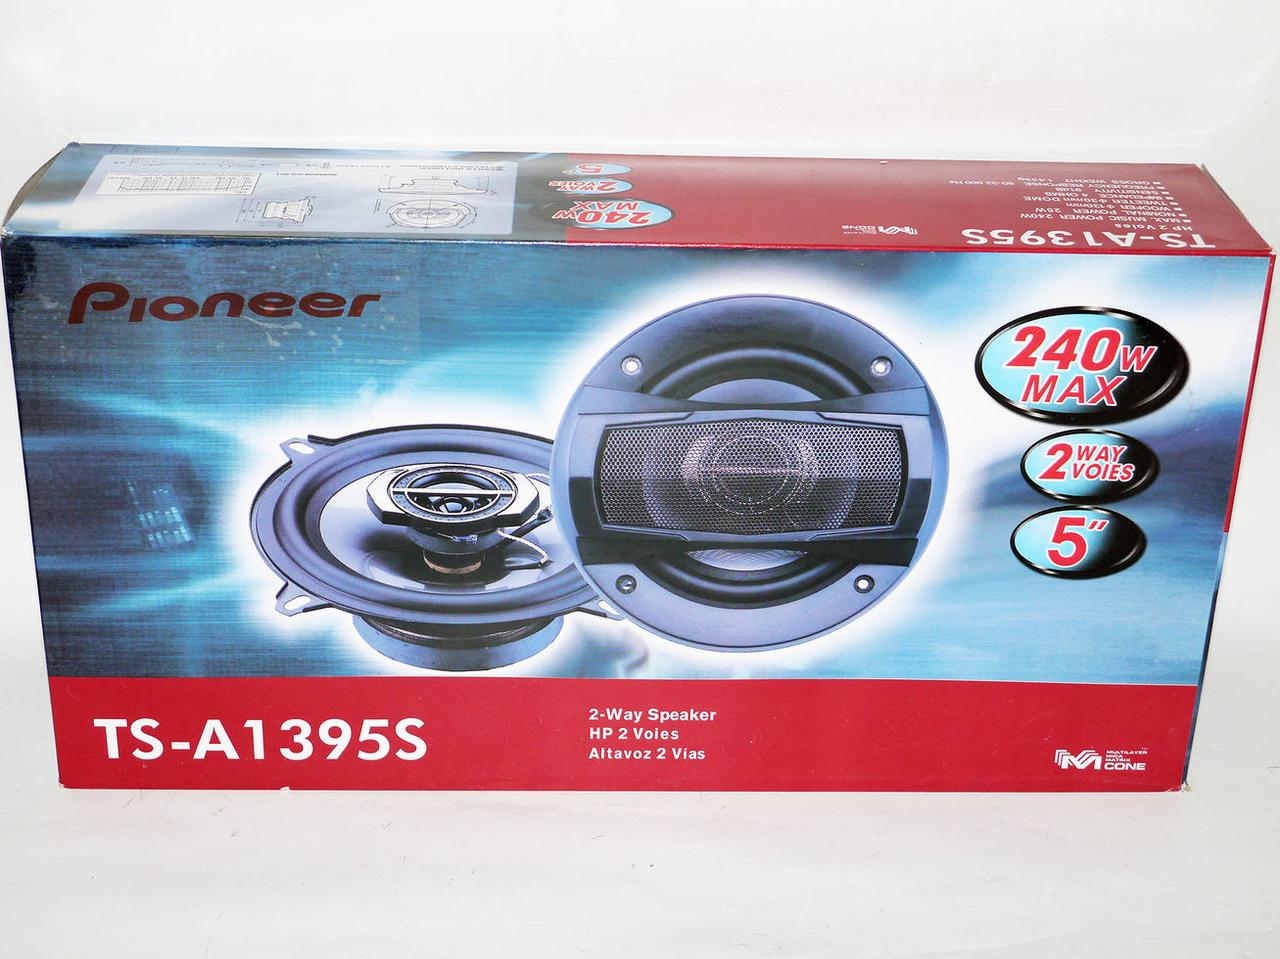 Динамики Pioneer TS-A1395S (240 Вт) 13 см